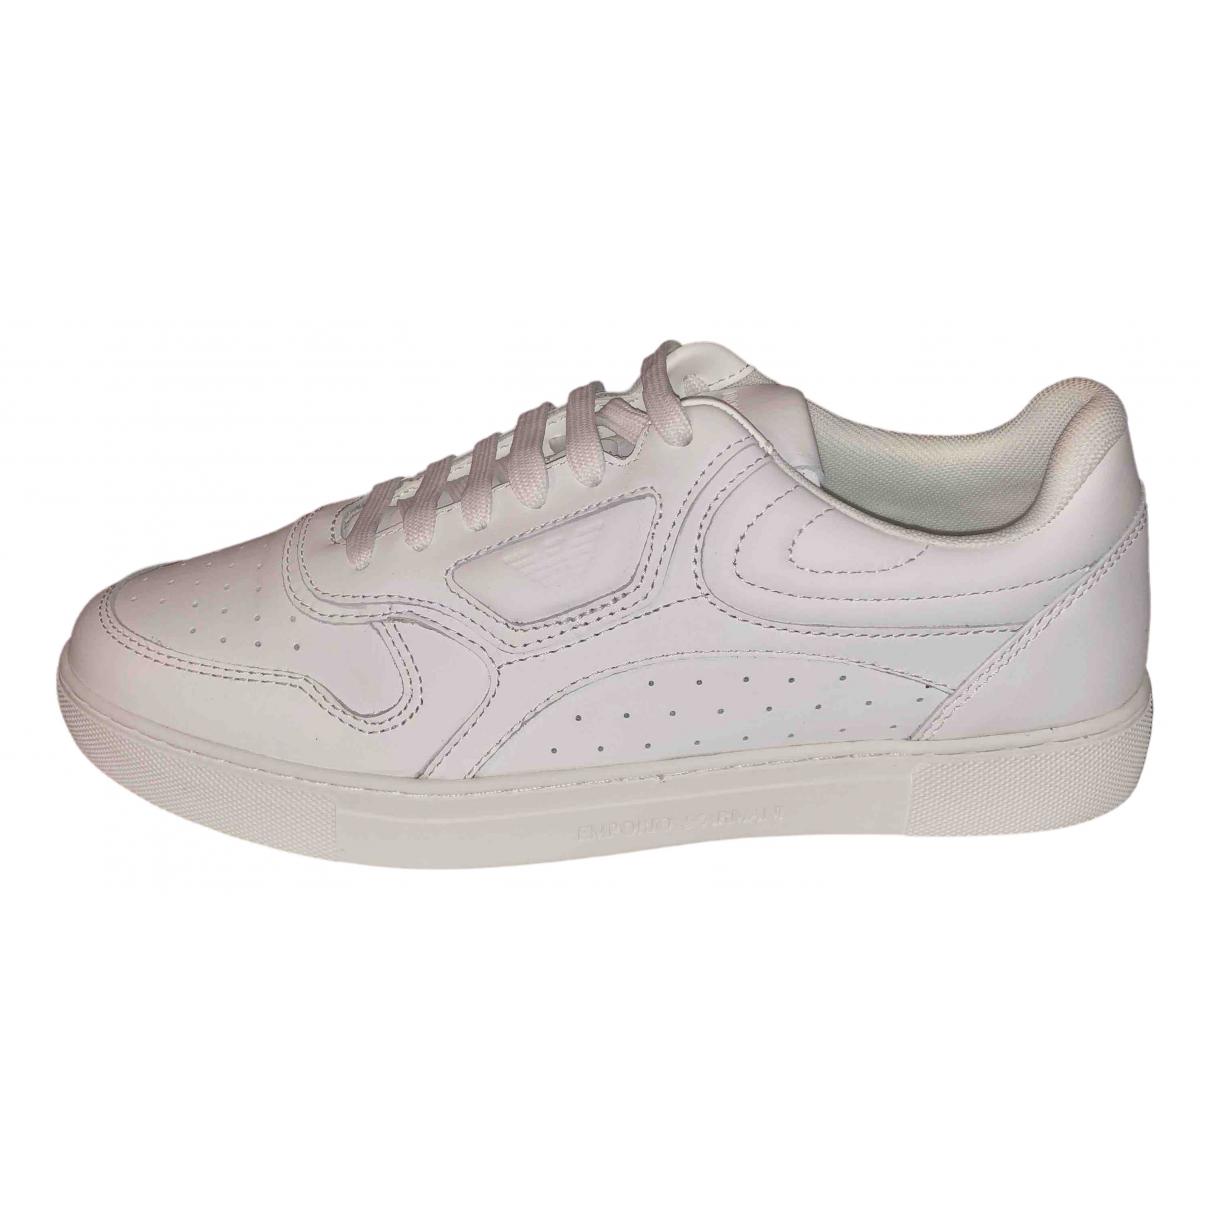 Emporio Armani \N White Leather Trainers for Women 40 EU